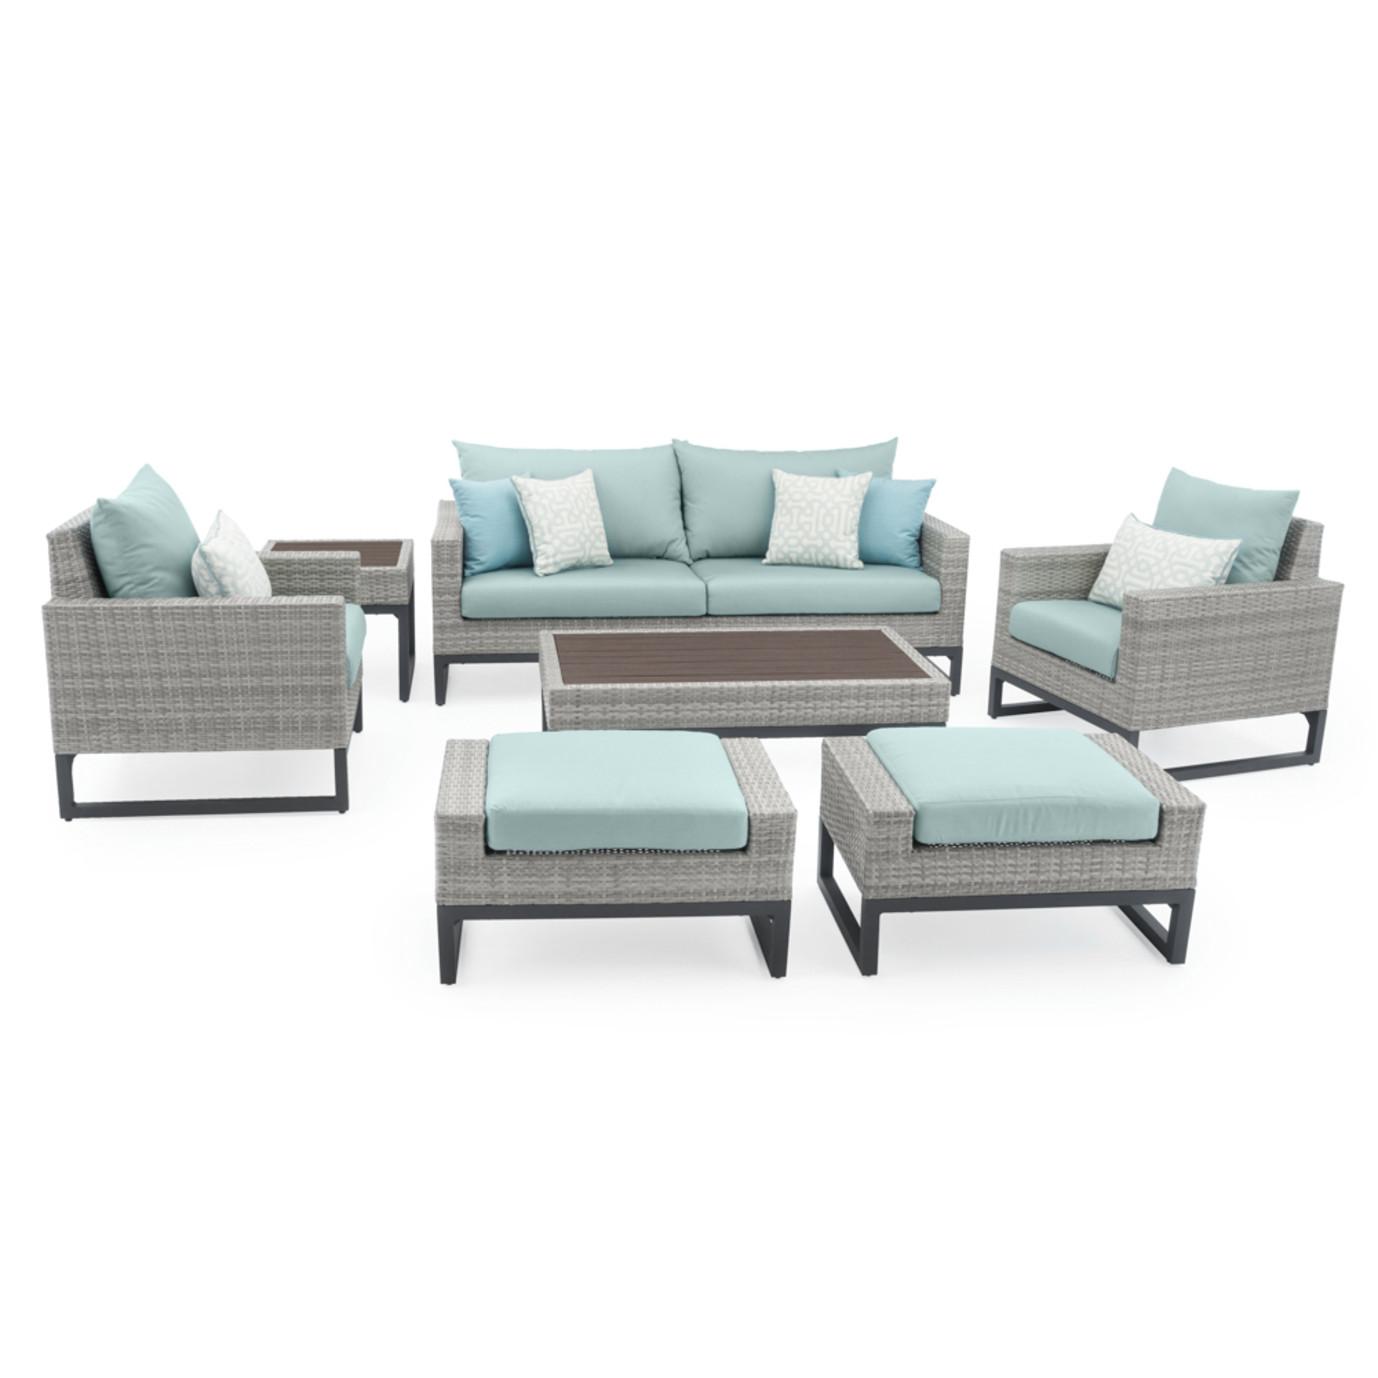 Milo™ Gray 7pc Deep Seating Set - Spa Blue